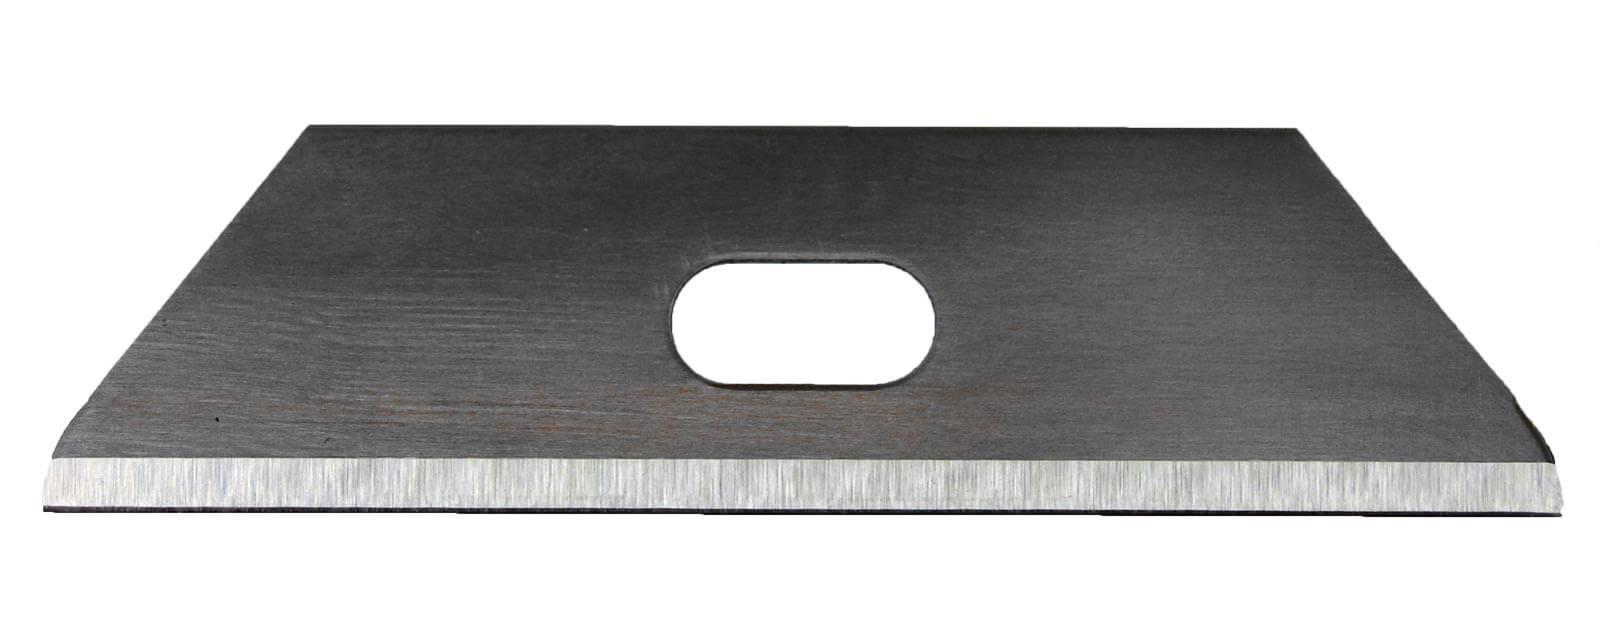 cuttermesser klinge trapezkling f r sicherheitsmesser uas100 curt. Black Bedroom Furniture Sets. Home Design Ideas